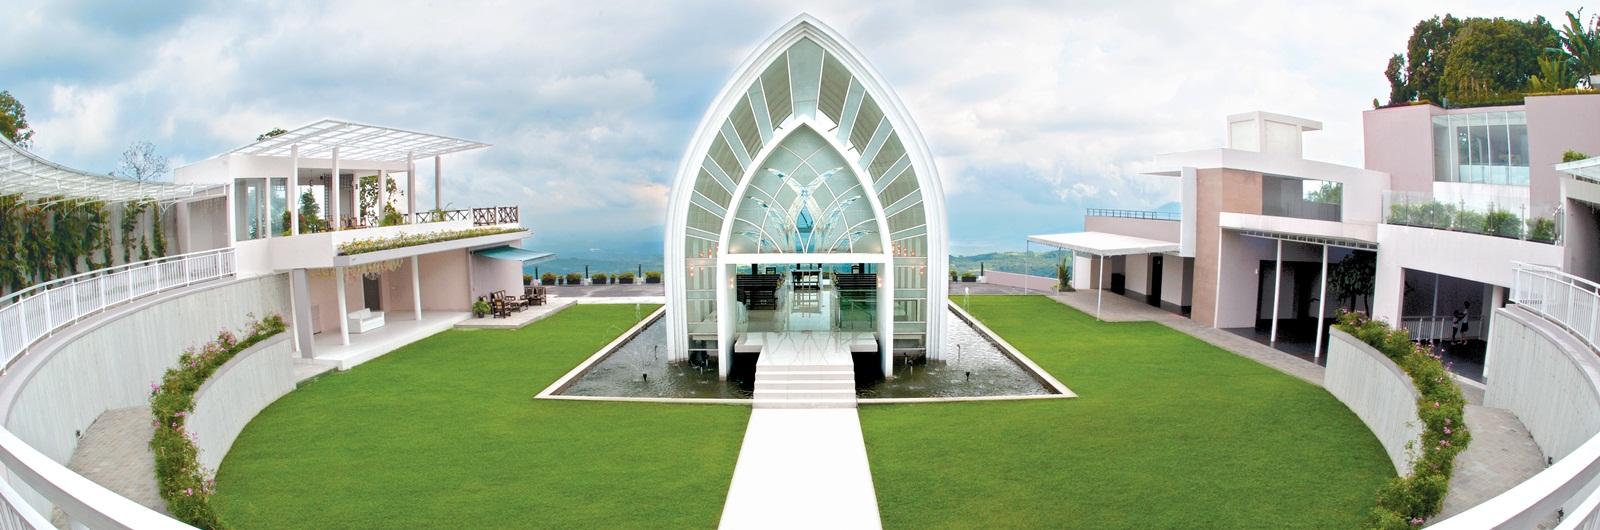 Harga Tiket Masuk Susan Spa Resort Bandungan Semarang Wisata Cocok